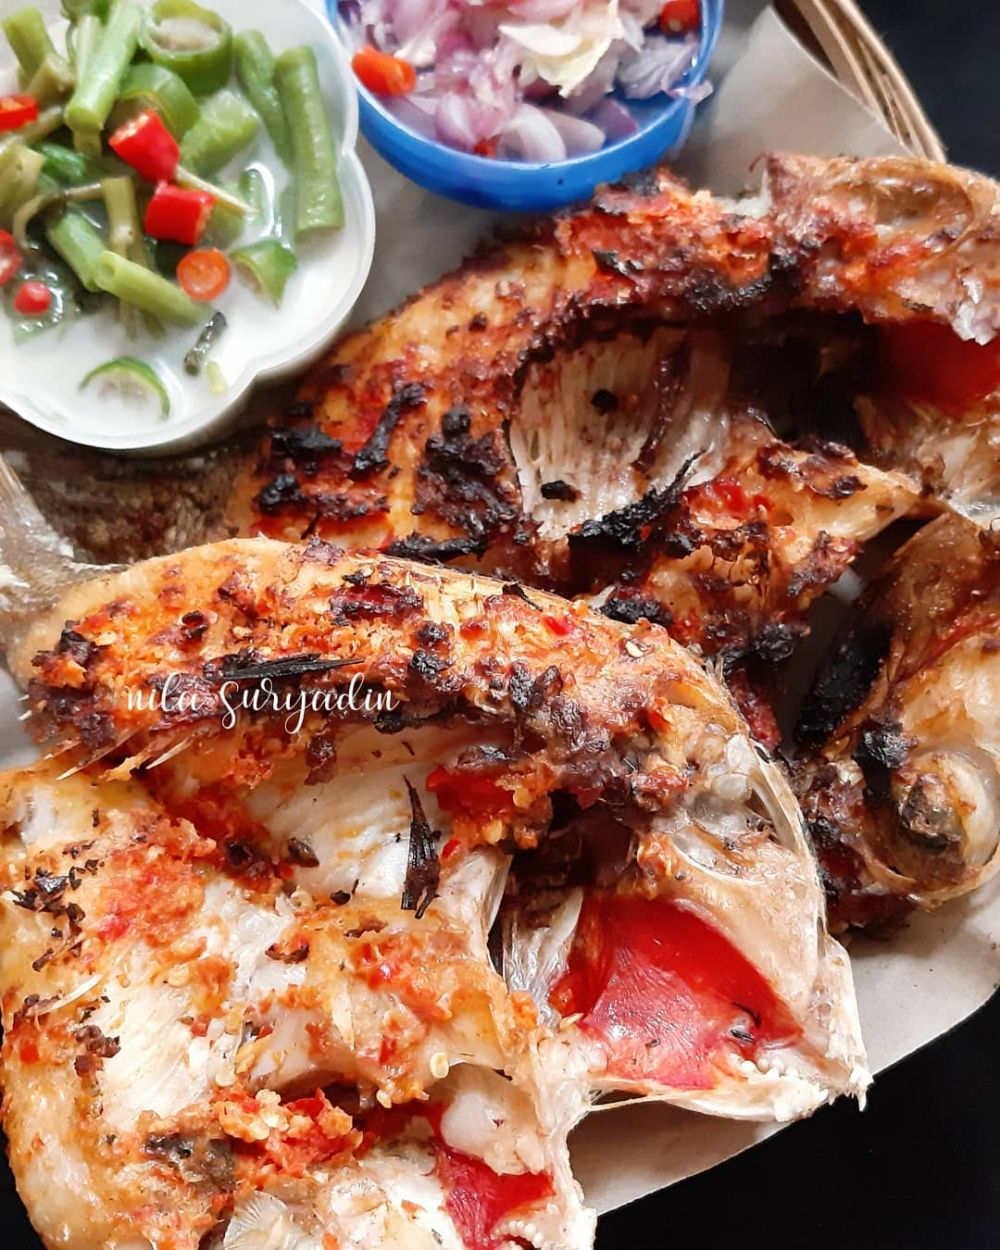 Resep Aneka Olahan Ikan Laut Istimewa Resep Resep Ikan Resep Masakan